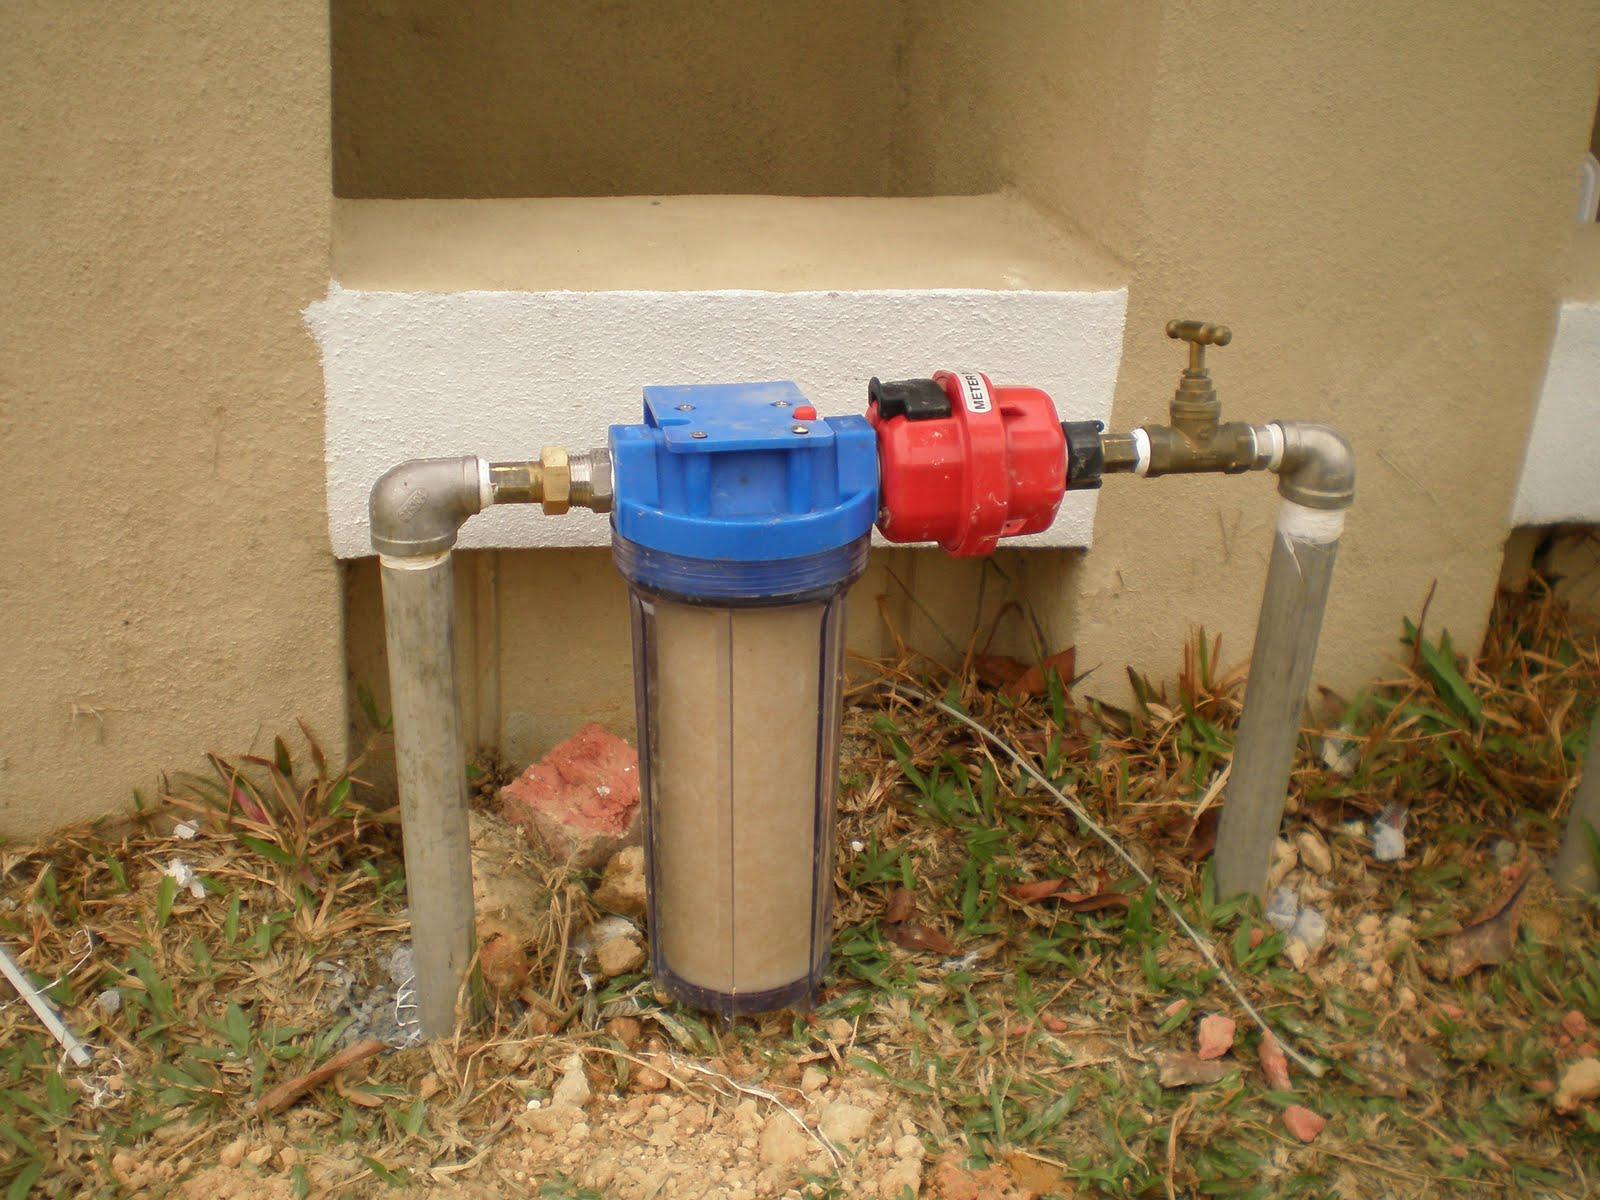 £їfë § ñđßōx GE outdoor water filter